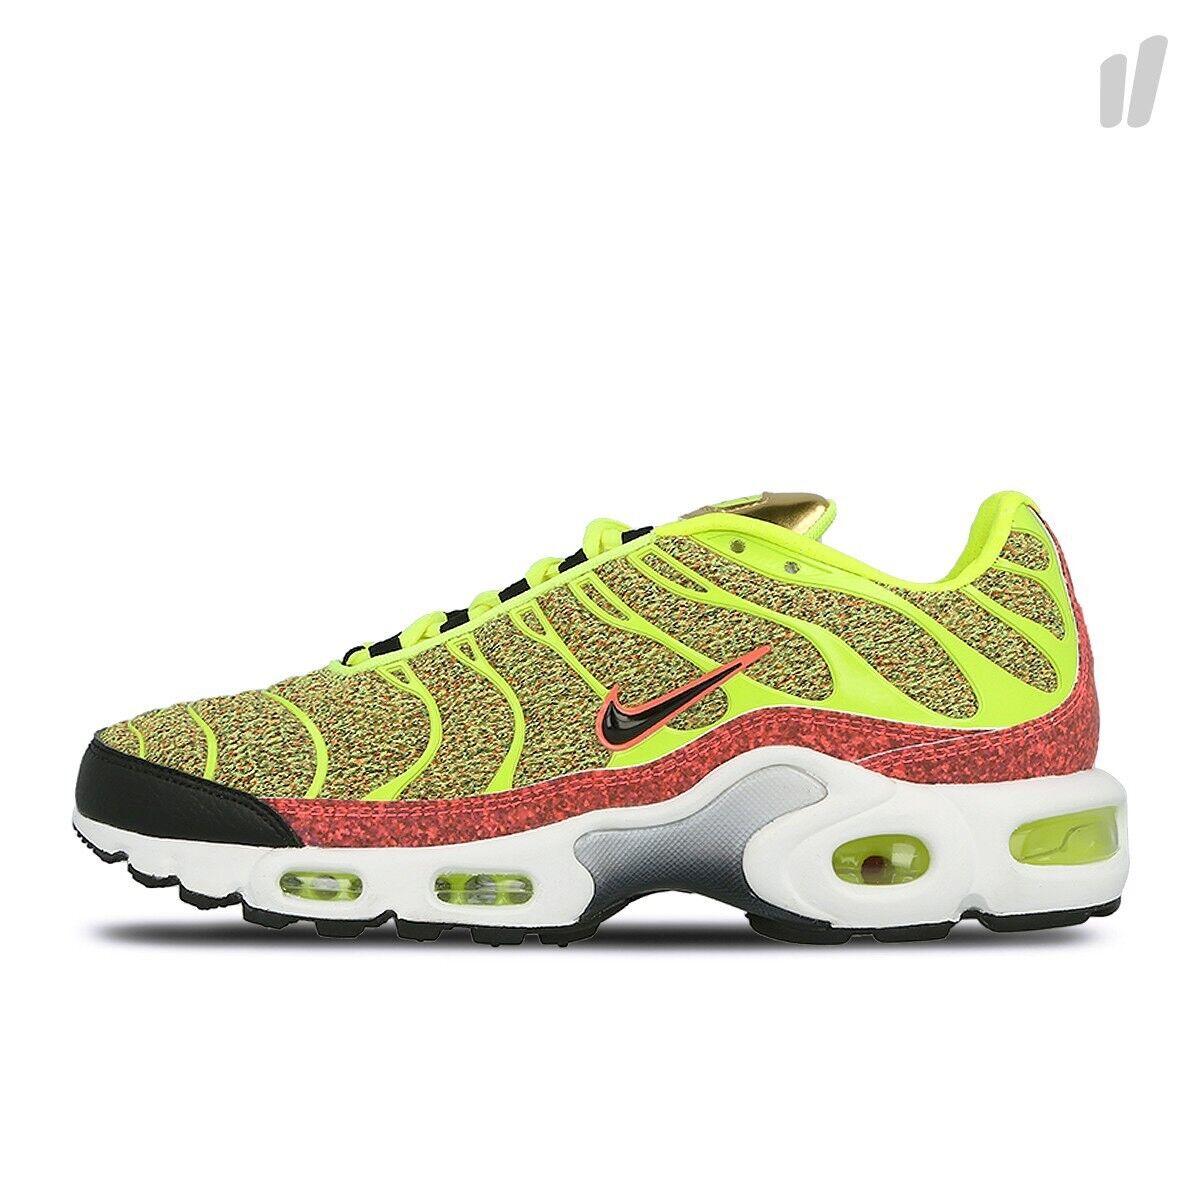 UK 6 Women's Nike Bir Max Plus SE Trainers EUR 40 US 8.5 862201-700 TN